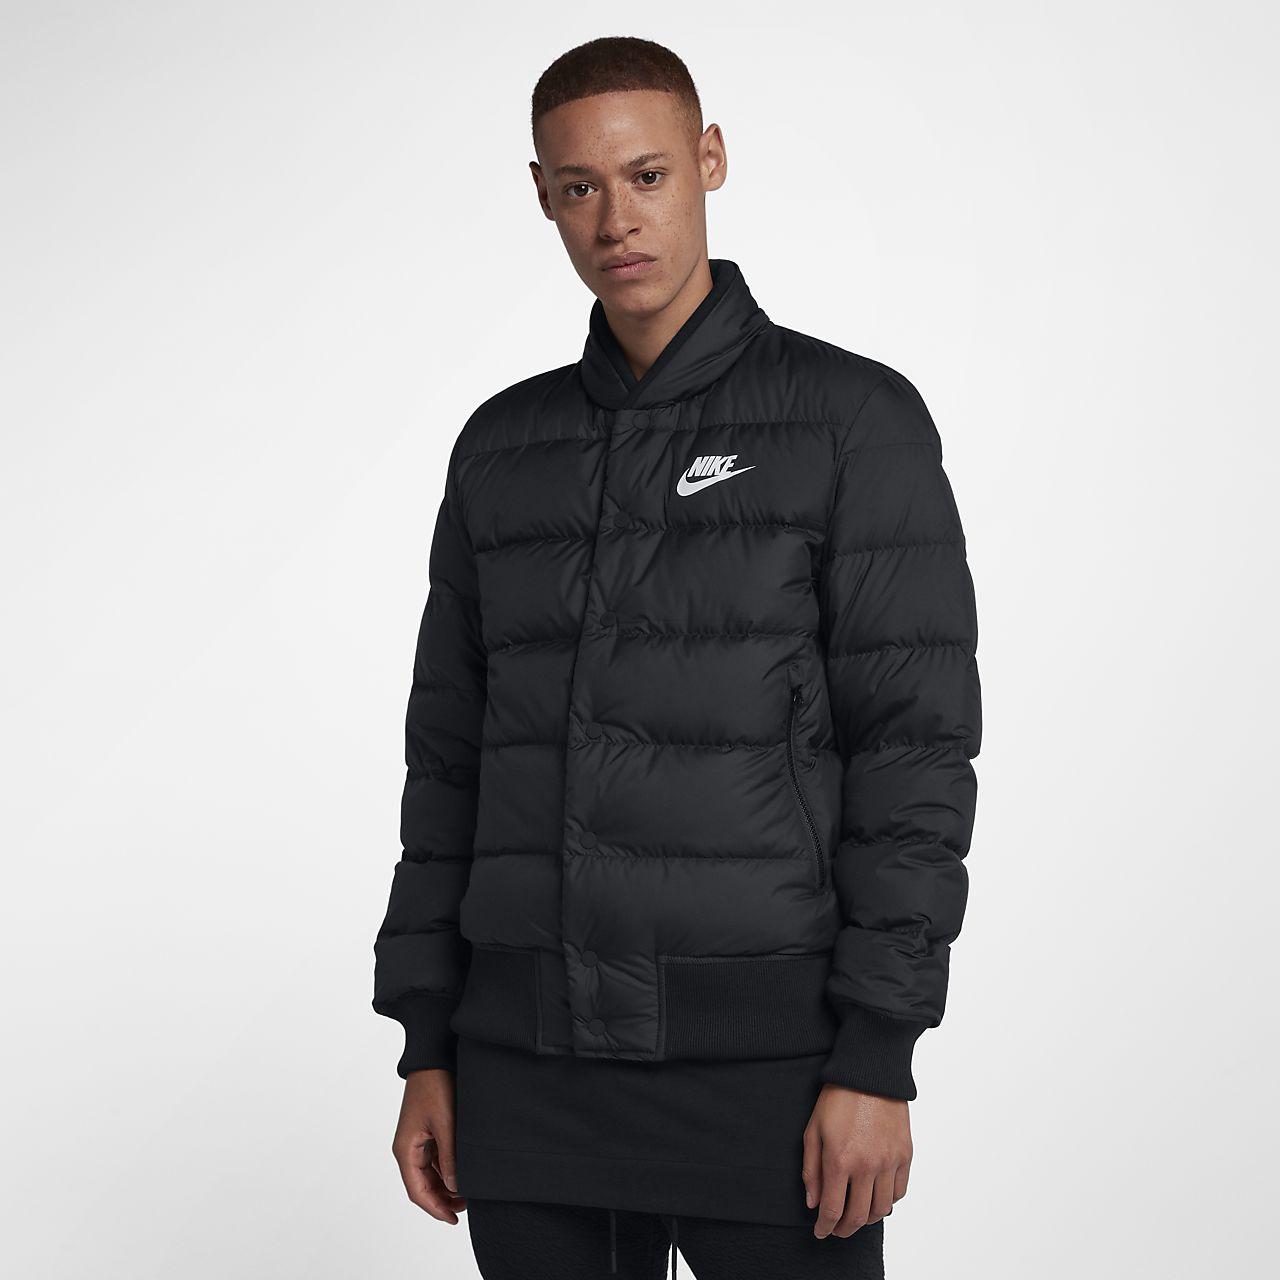 Es Down Sportswear Nike Hombre Fill Bomber Chaqueta wTPx6Rfq